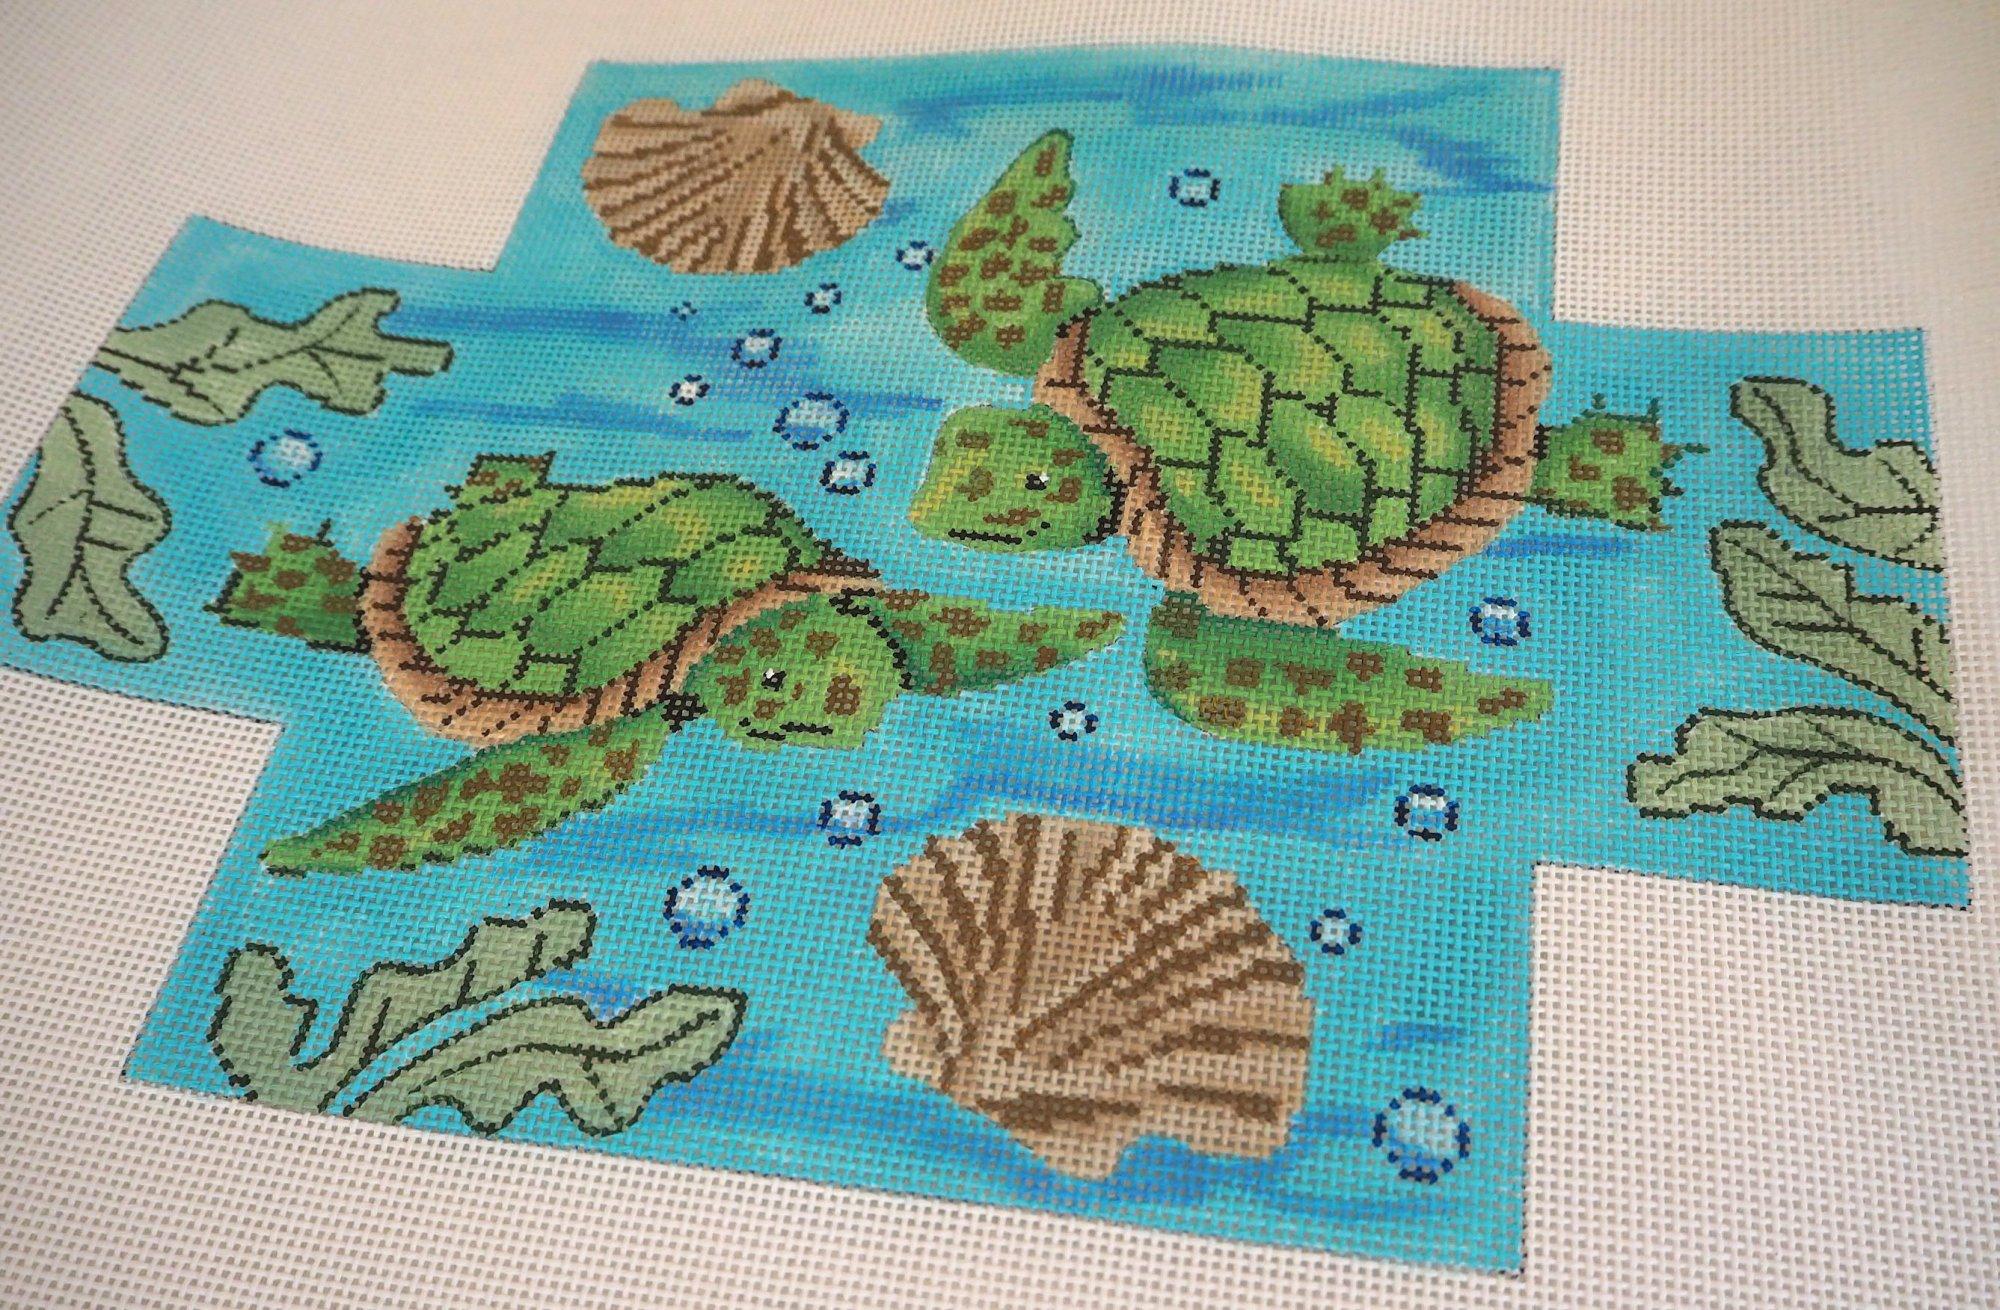 Sea Turtles Brick Cover GE438